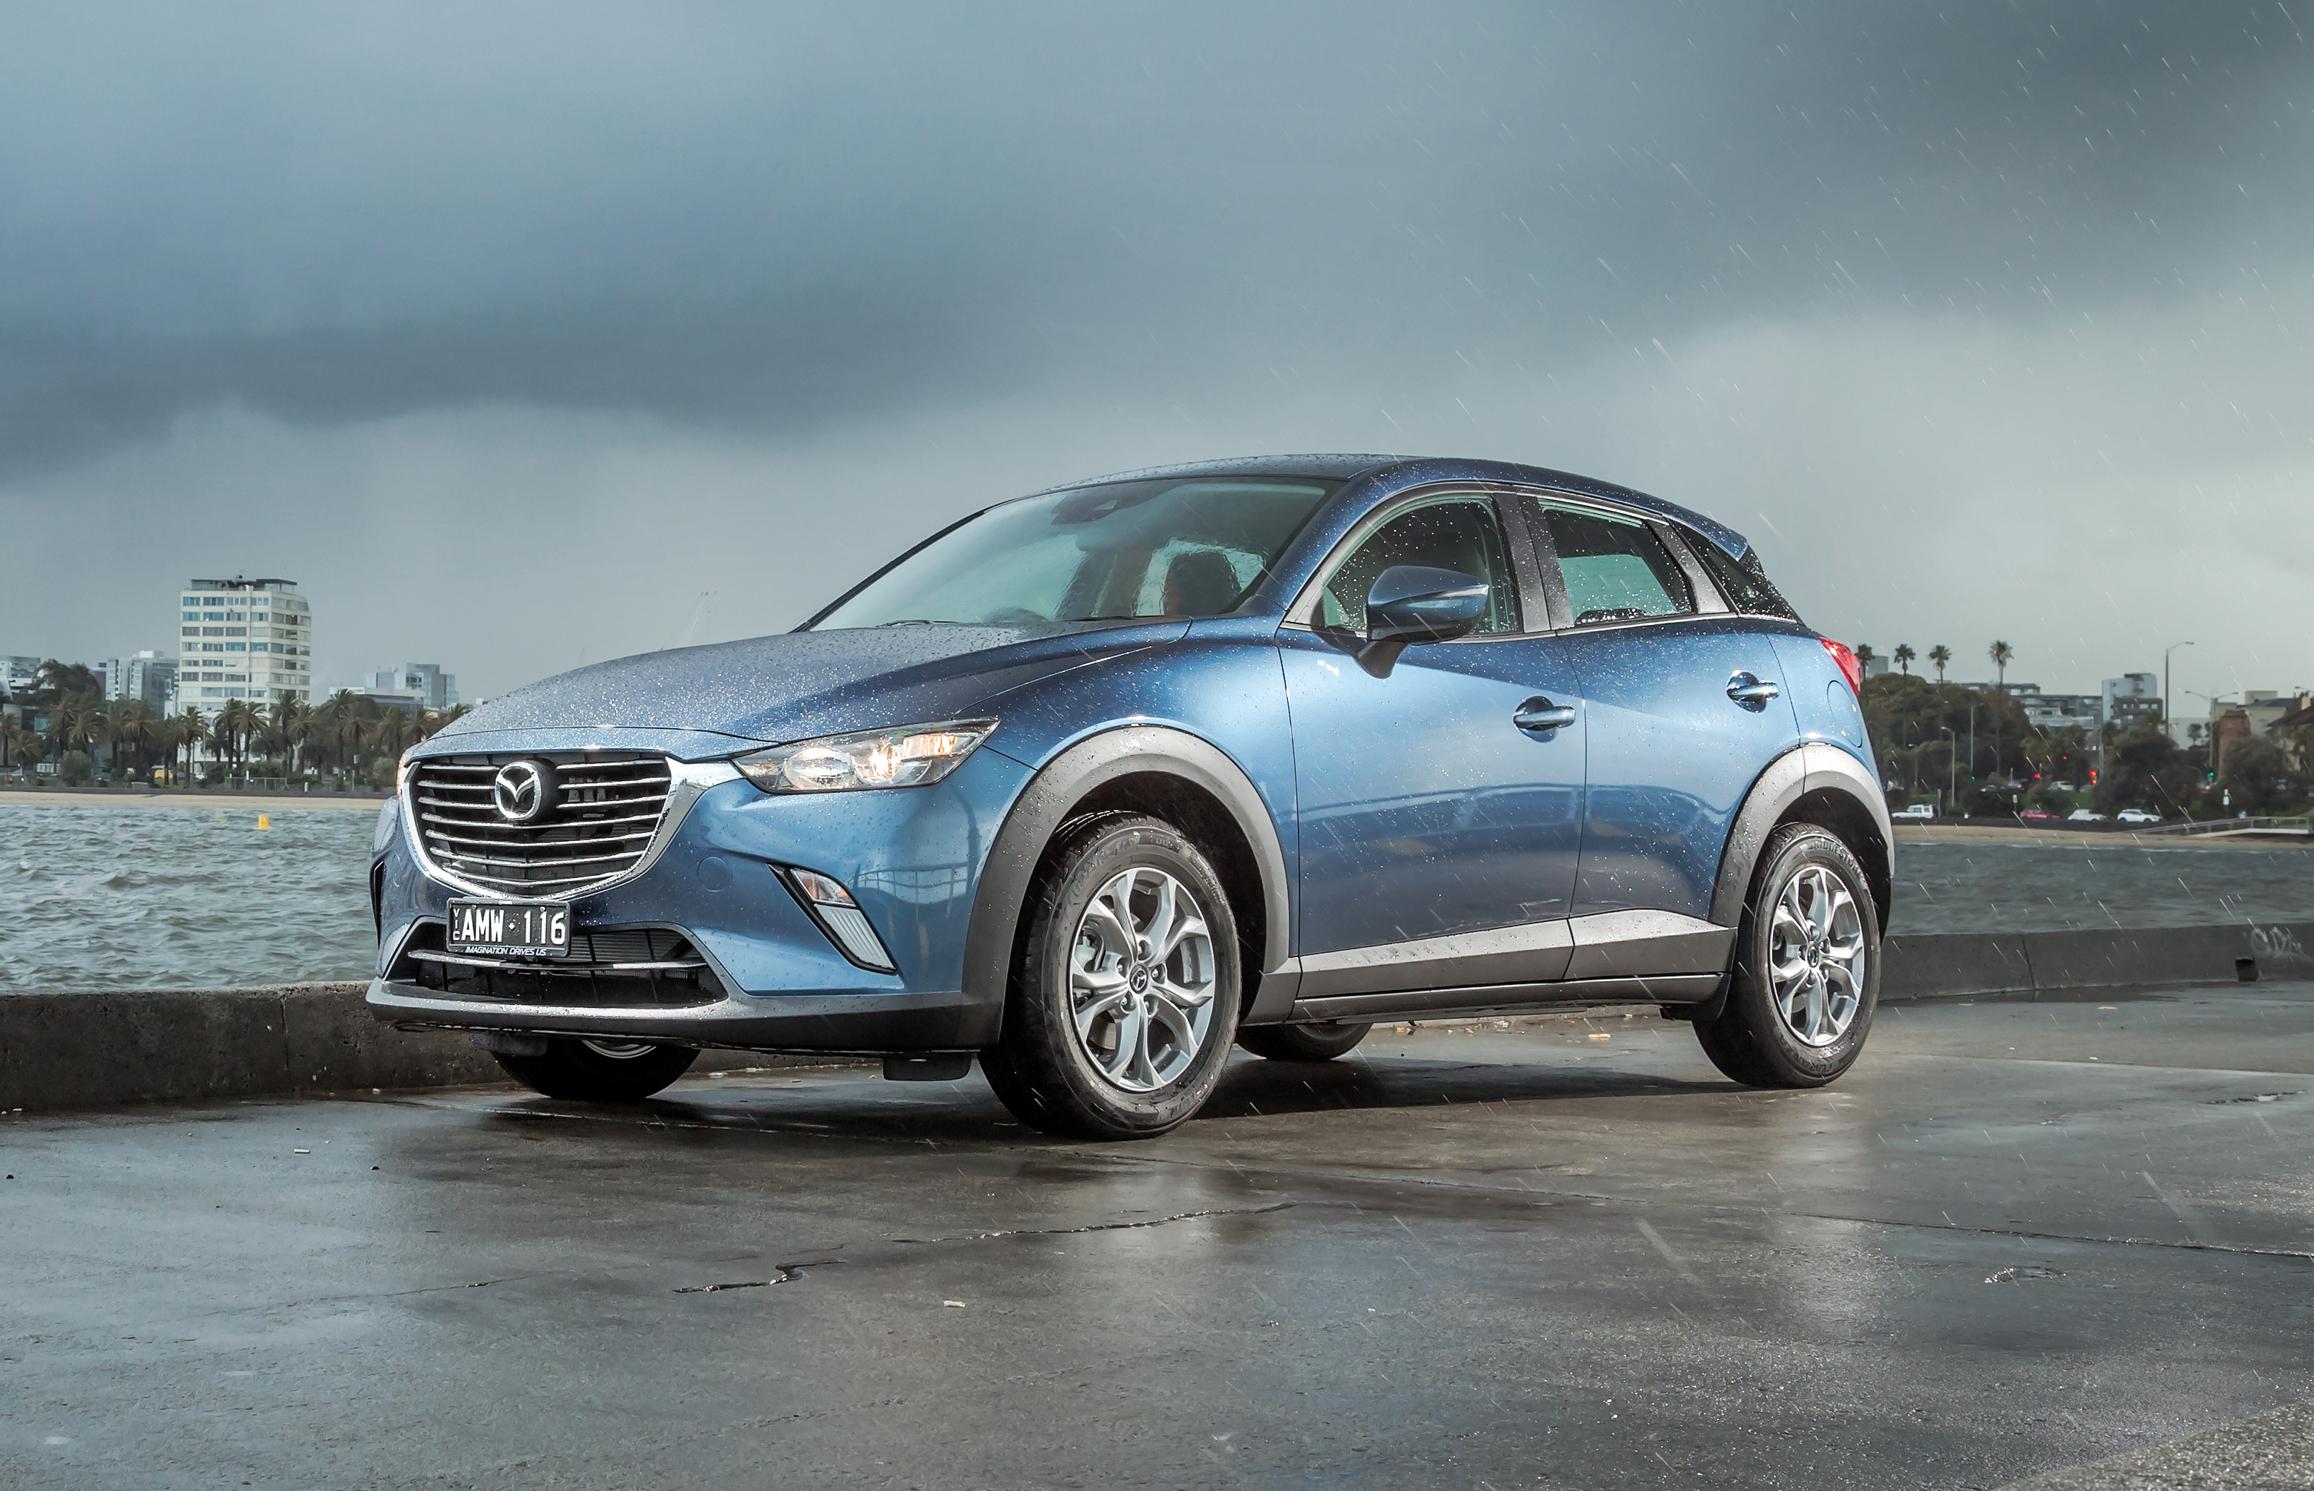 Mazda Cx 3 2019 >> 2017 Mazda CX-3 pricing and specs - photos | CarAdvice